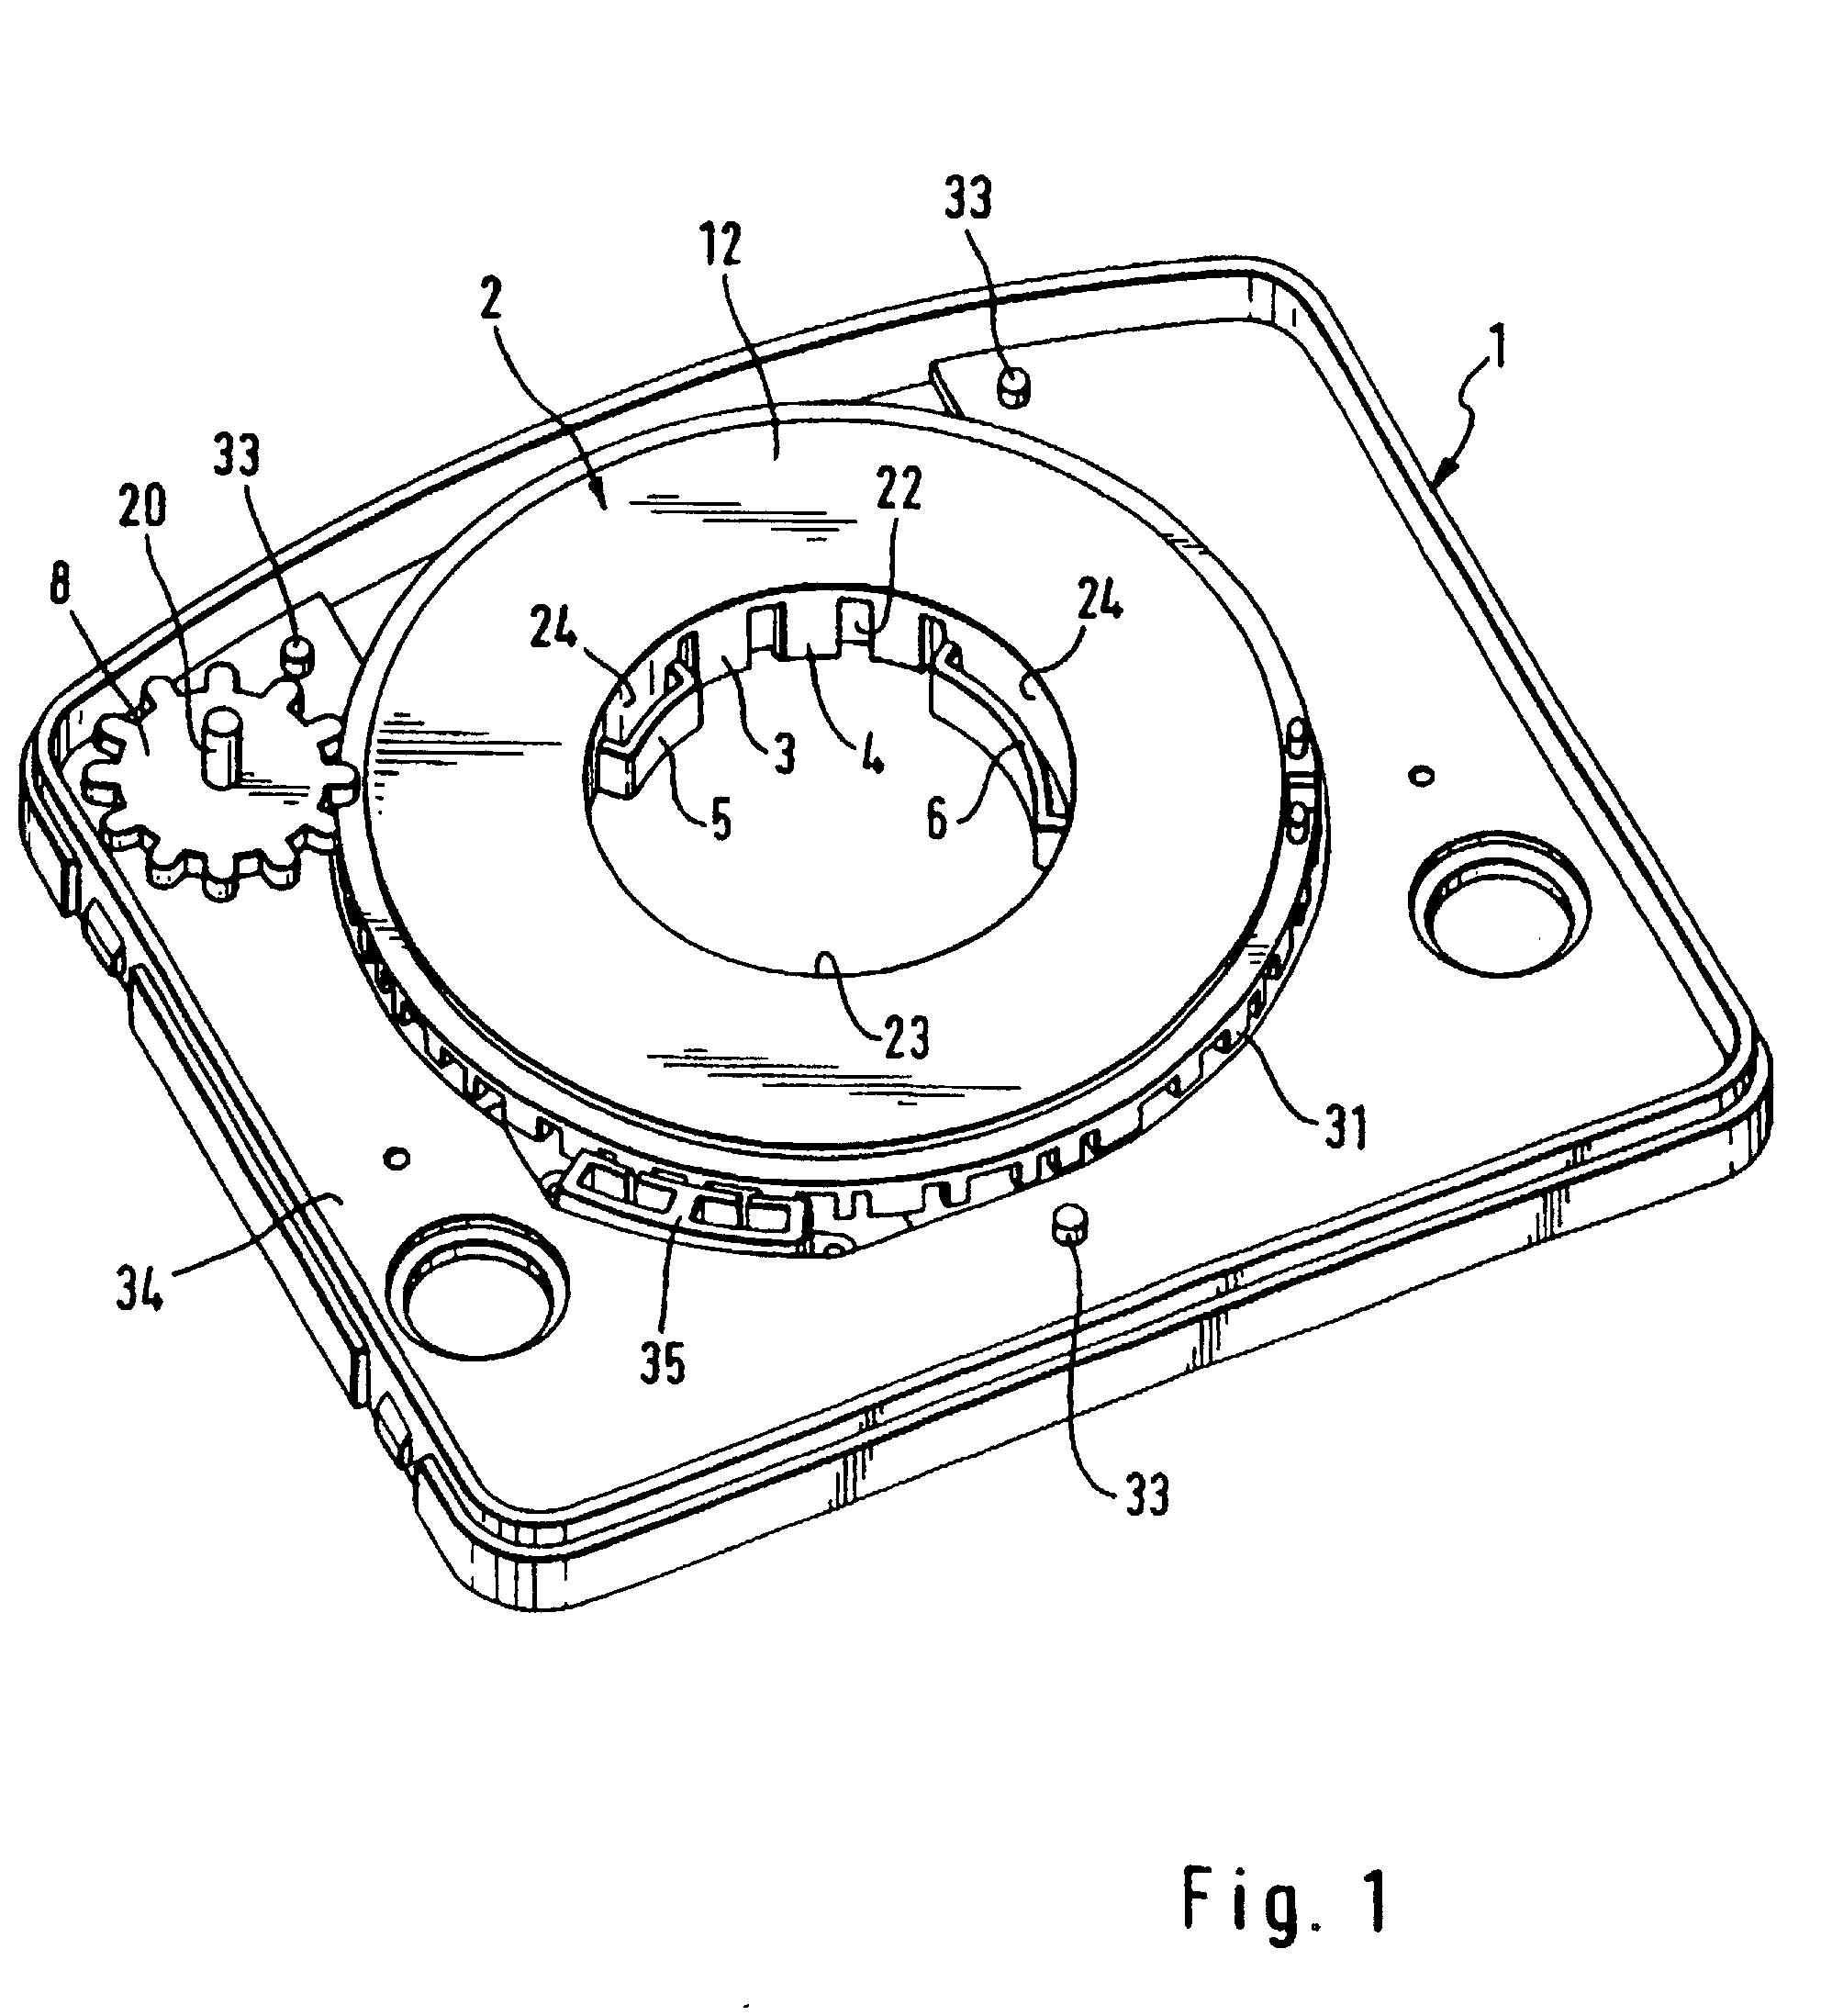 patent ep0874974b1 aufbau eines lenkwinkelsensormoduls. Black Bedroom Furniture Sets. Home Design Ideas